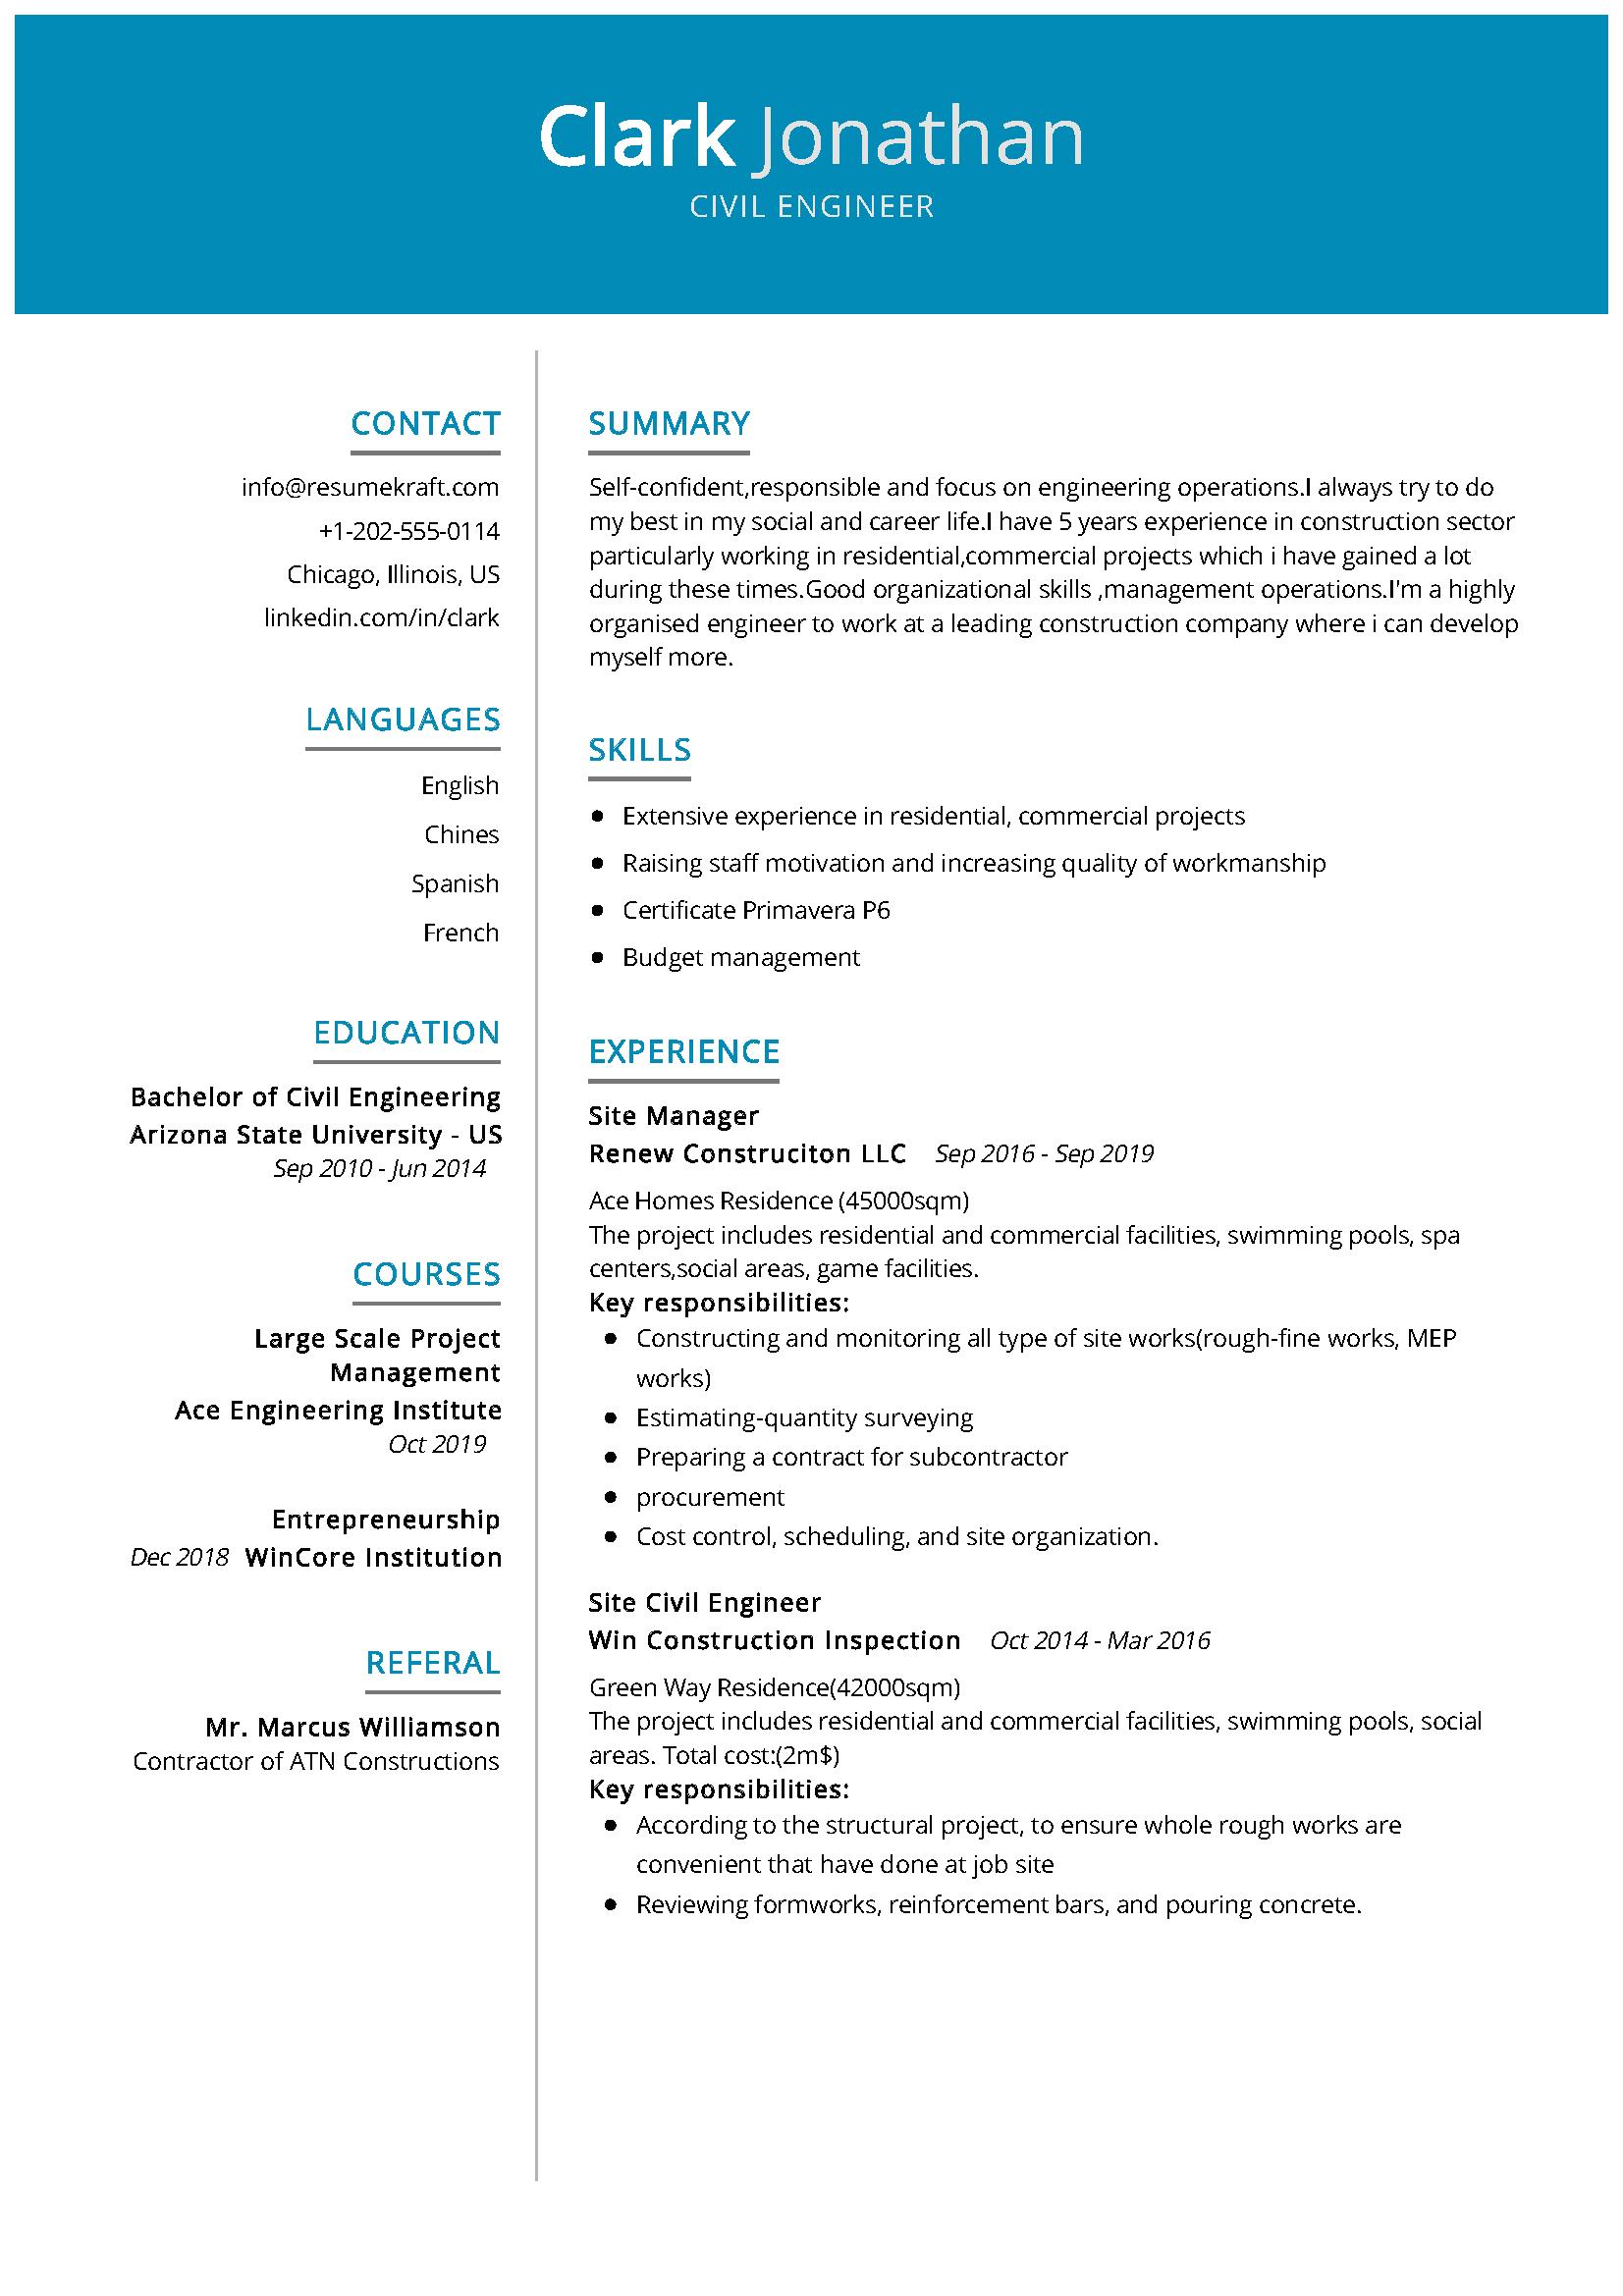 Civil Engineer Resume Sample Resumekraft